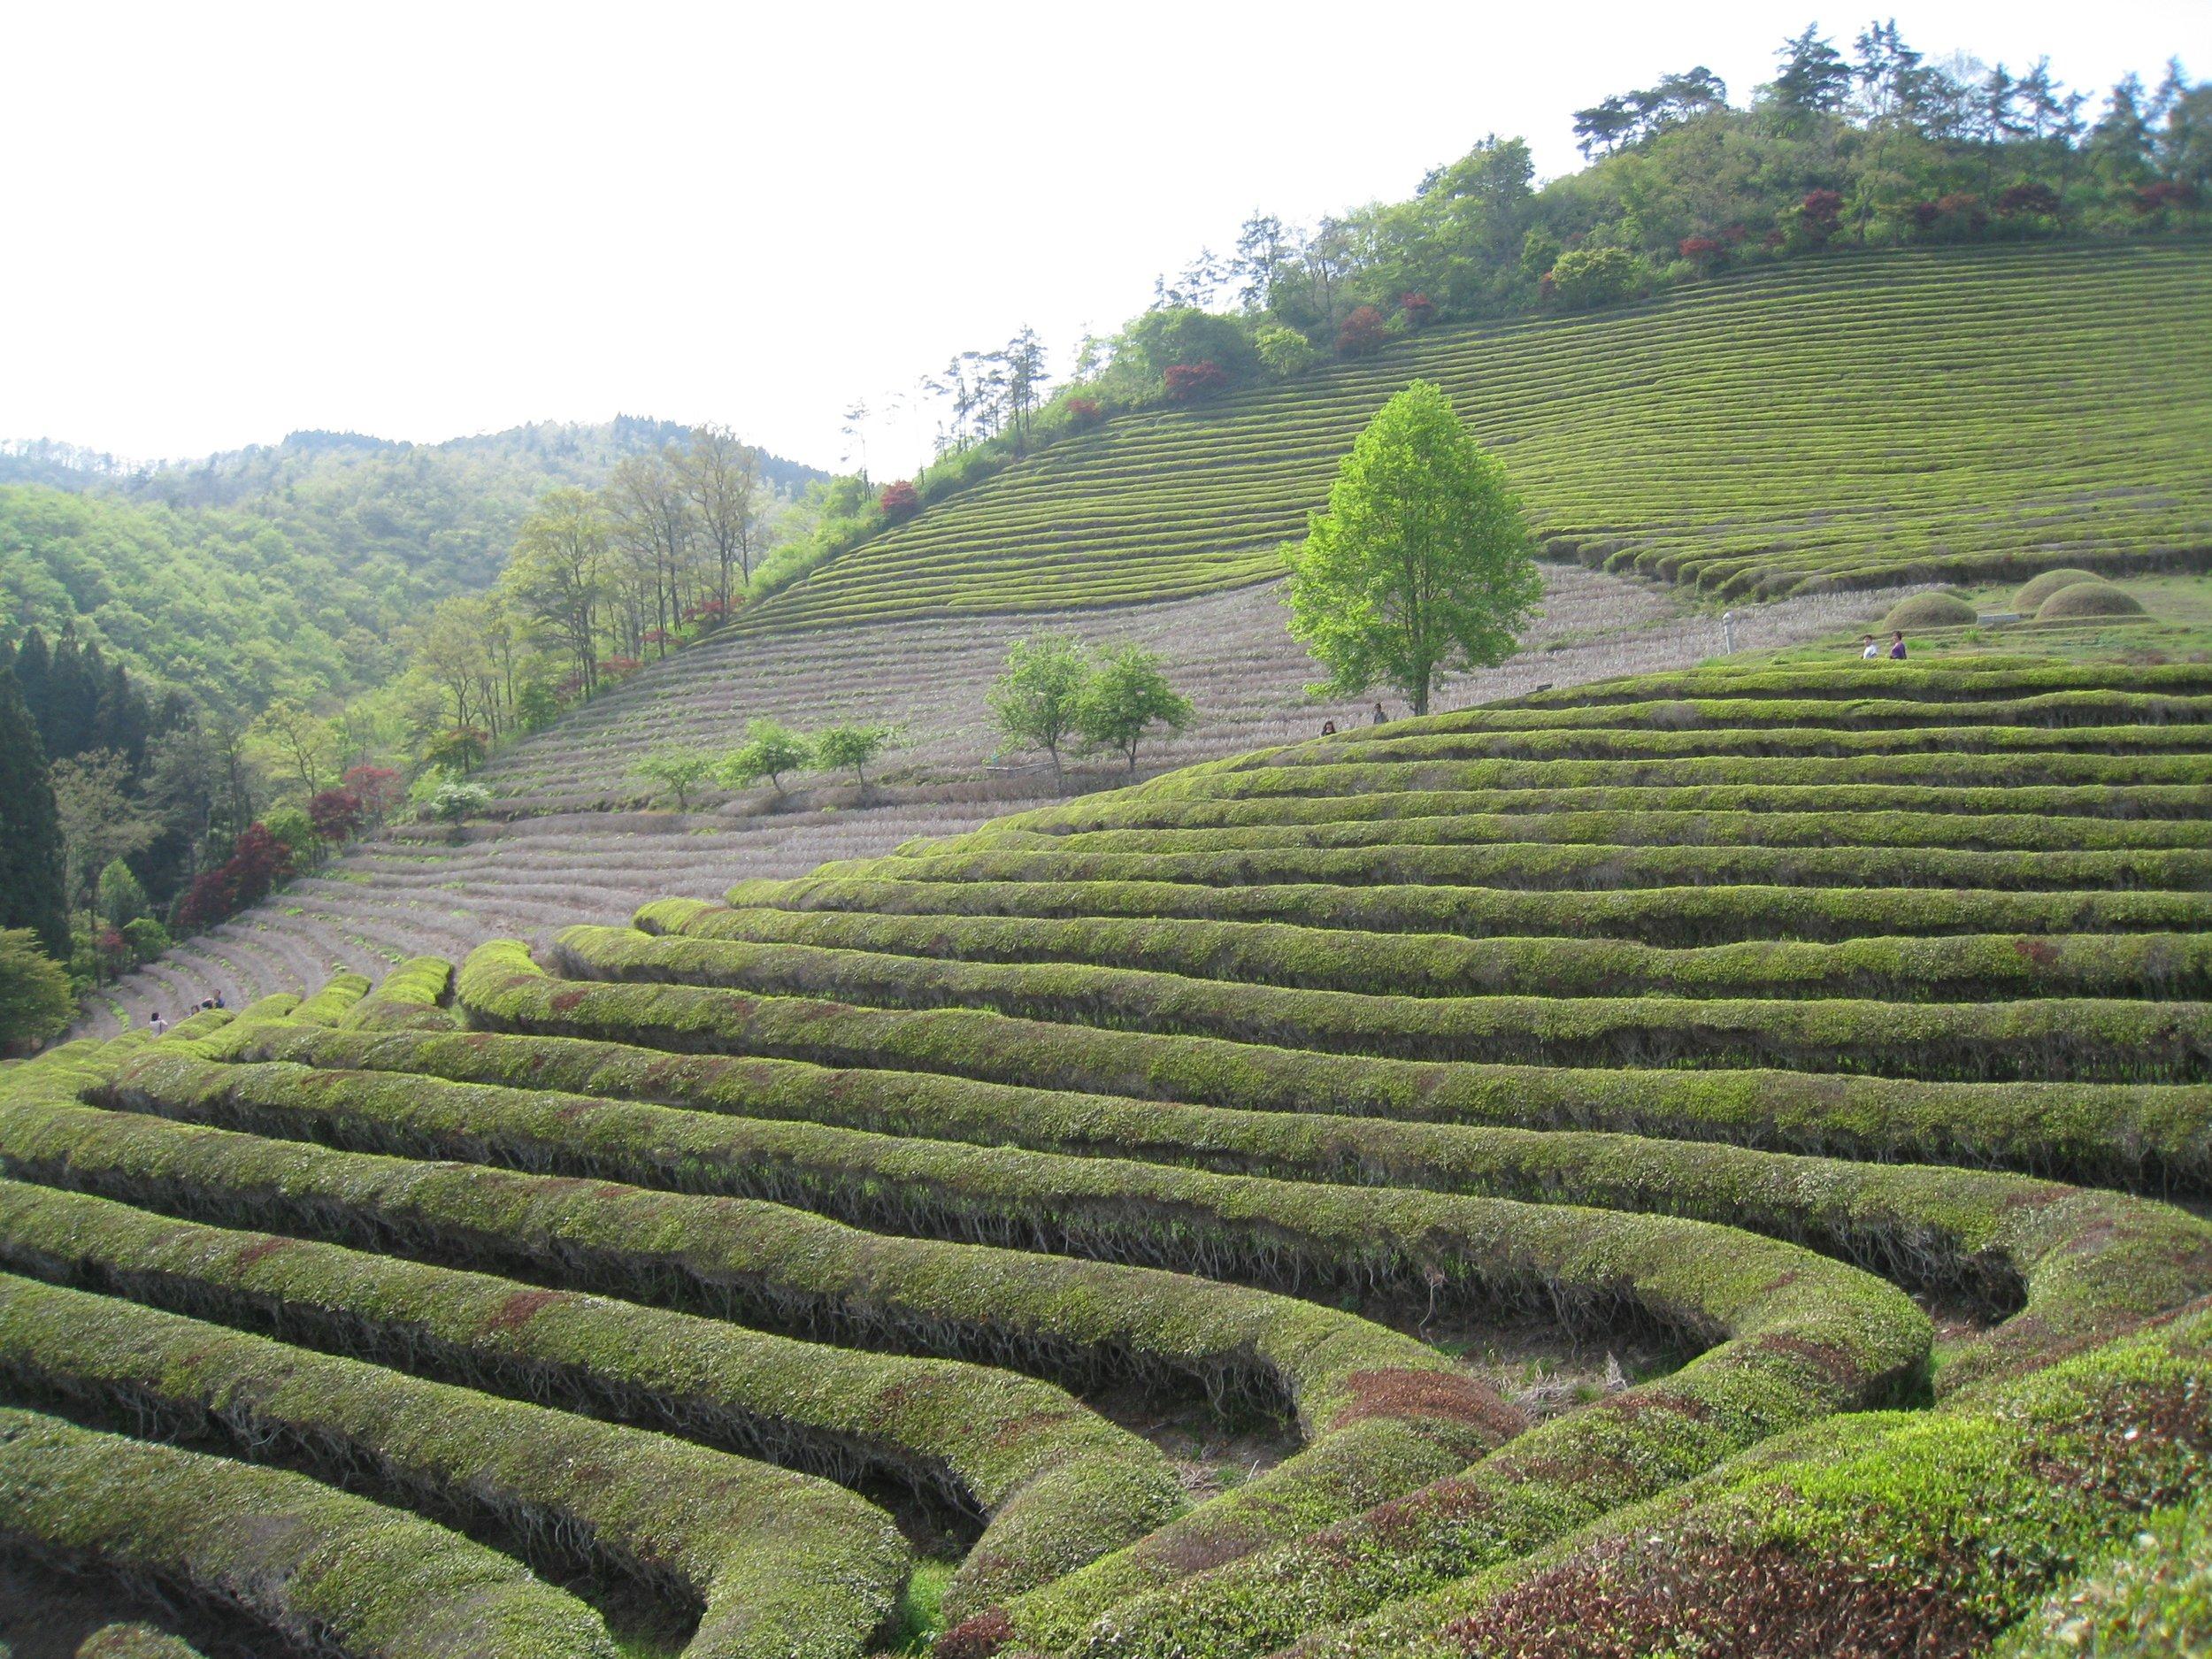 The Boseong Tea Fields in South Korea